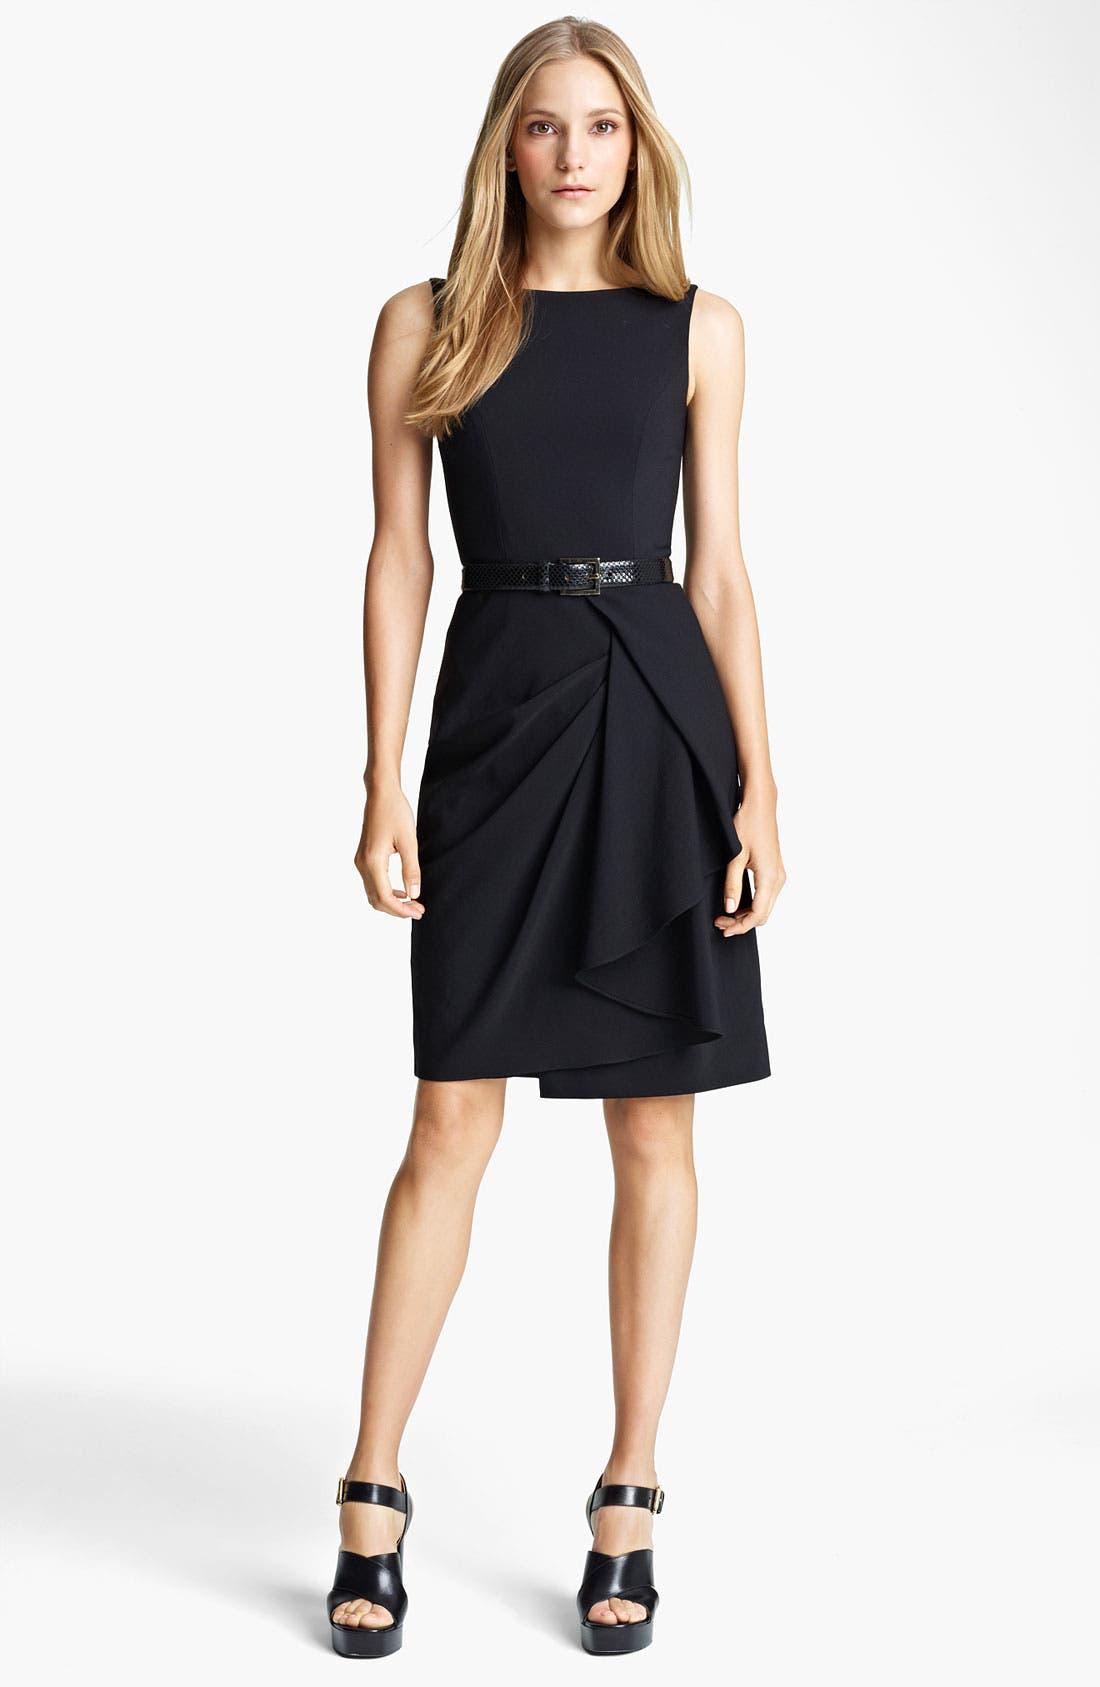 Alternate Image 1 Selected - Michael Kors Lightweight Crepe Sheath Dress